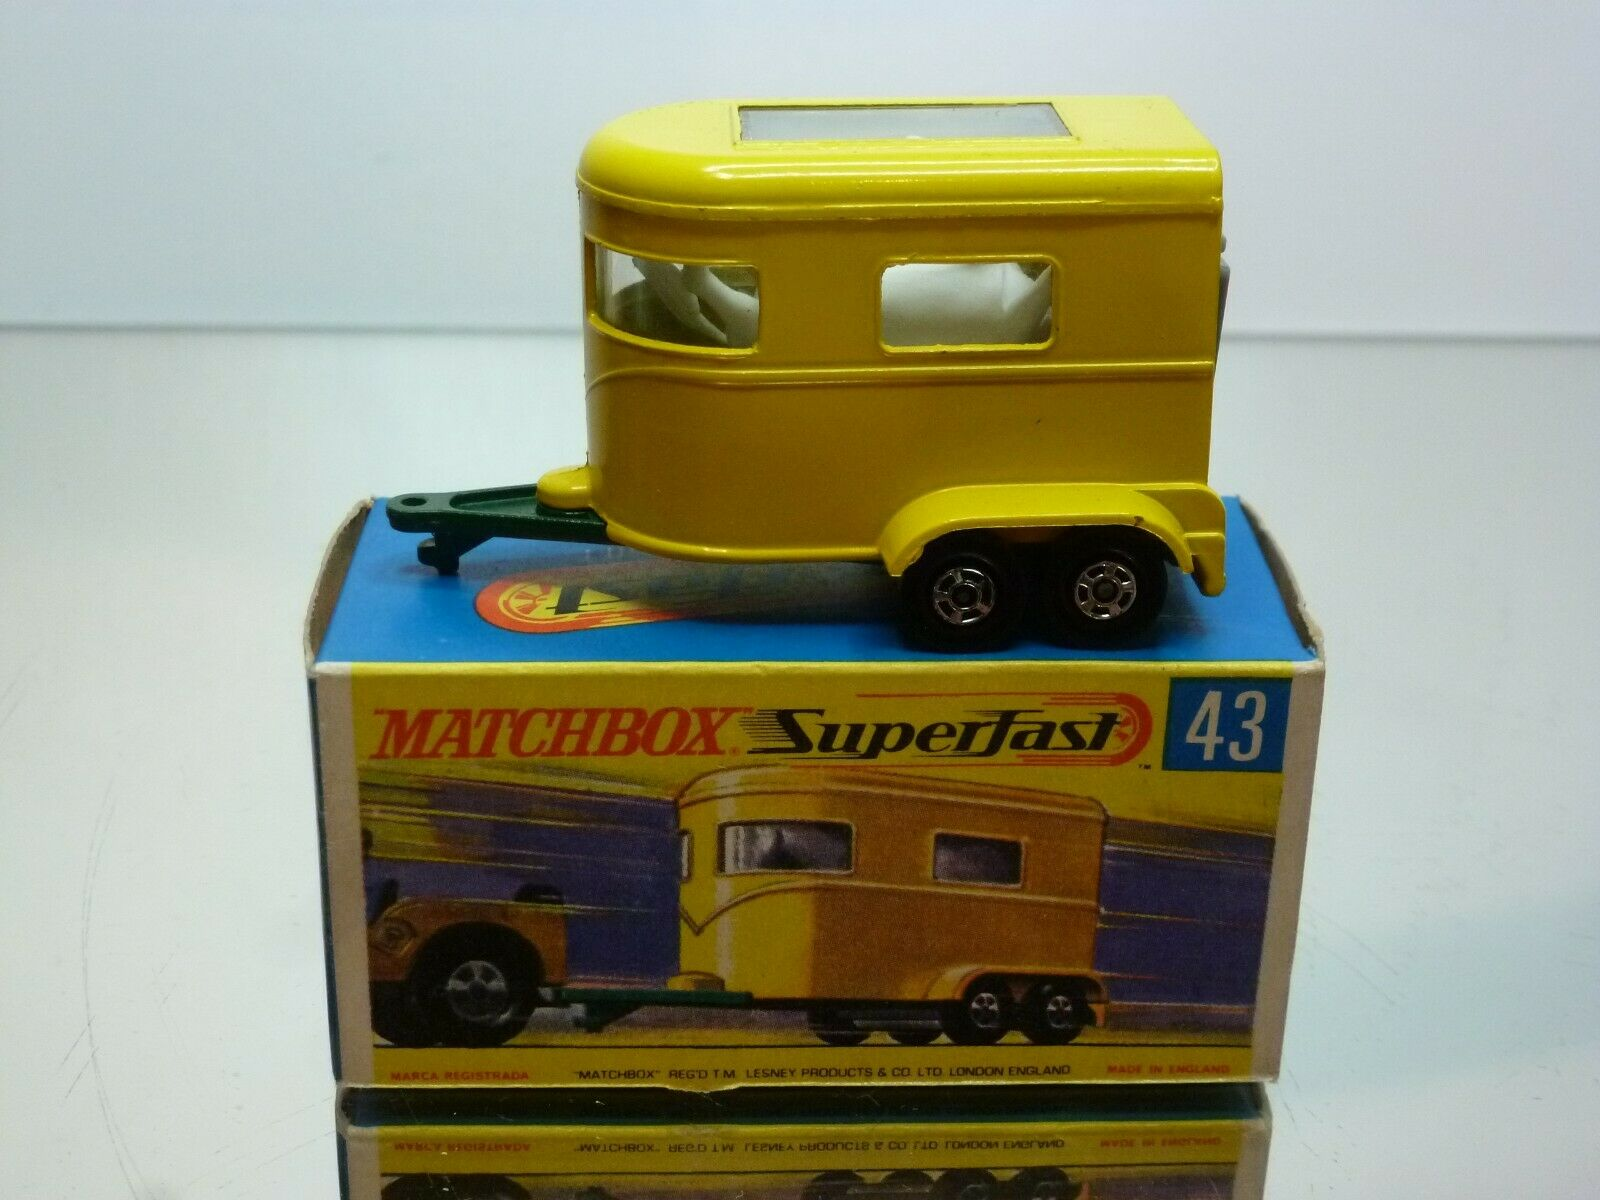 MATCHBOX SUPERFAST 43 PONY TRAILER + HORSES - jaune - VERY GOOD IN BOX